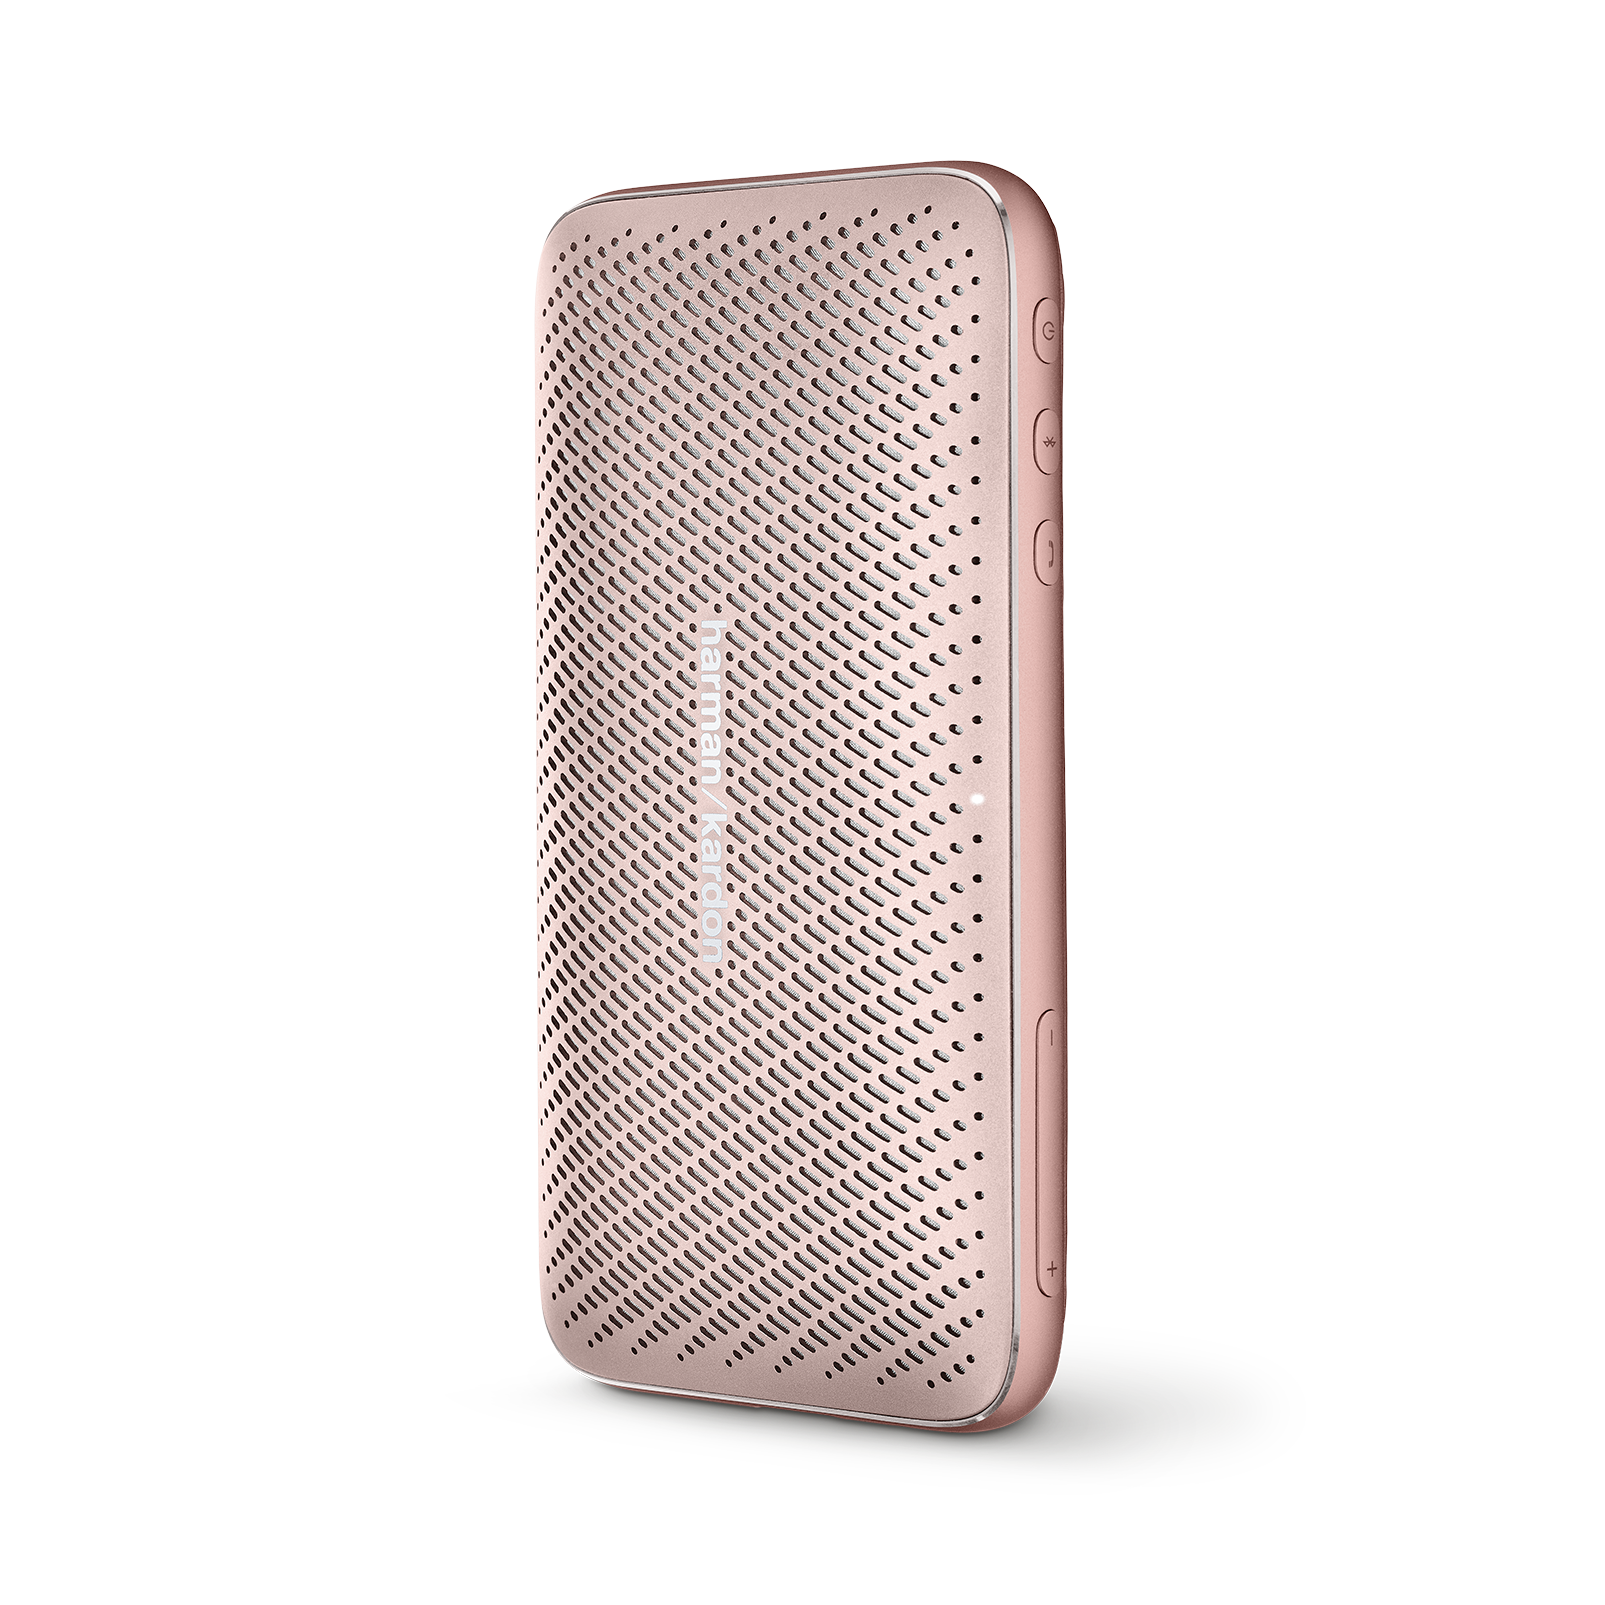 Harman Kardon Esquire Mini 2 - Gold - Ultra-slim and portable premium Bluetooth Speaker - Detailshot 2